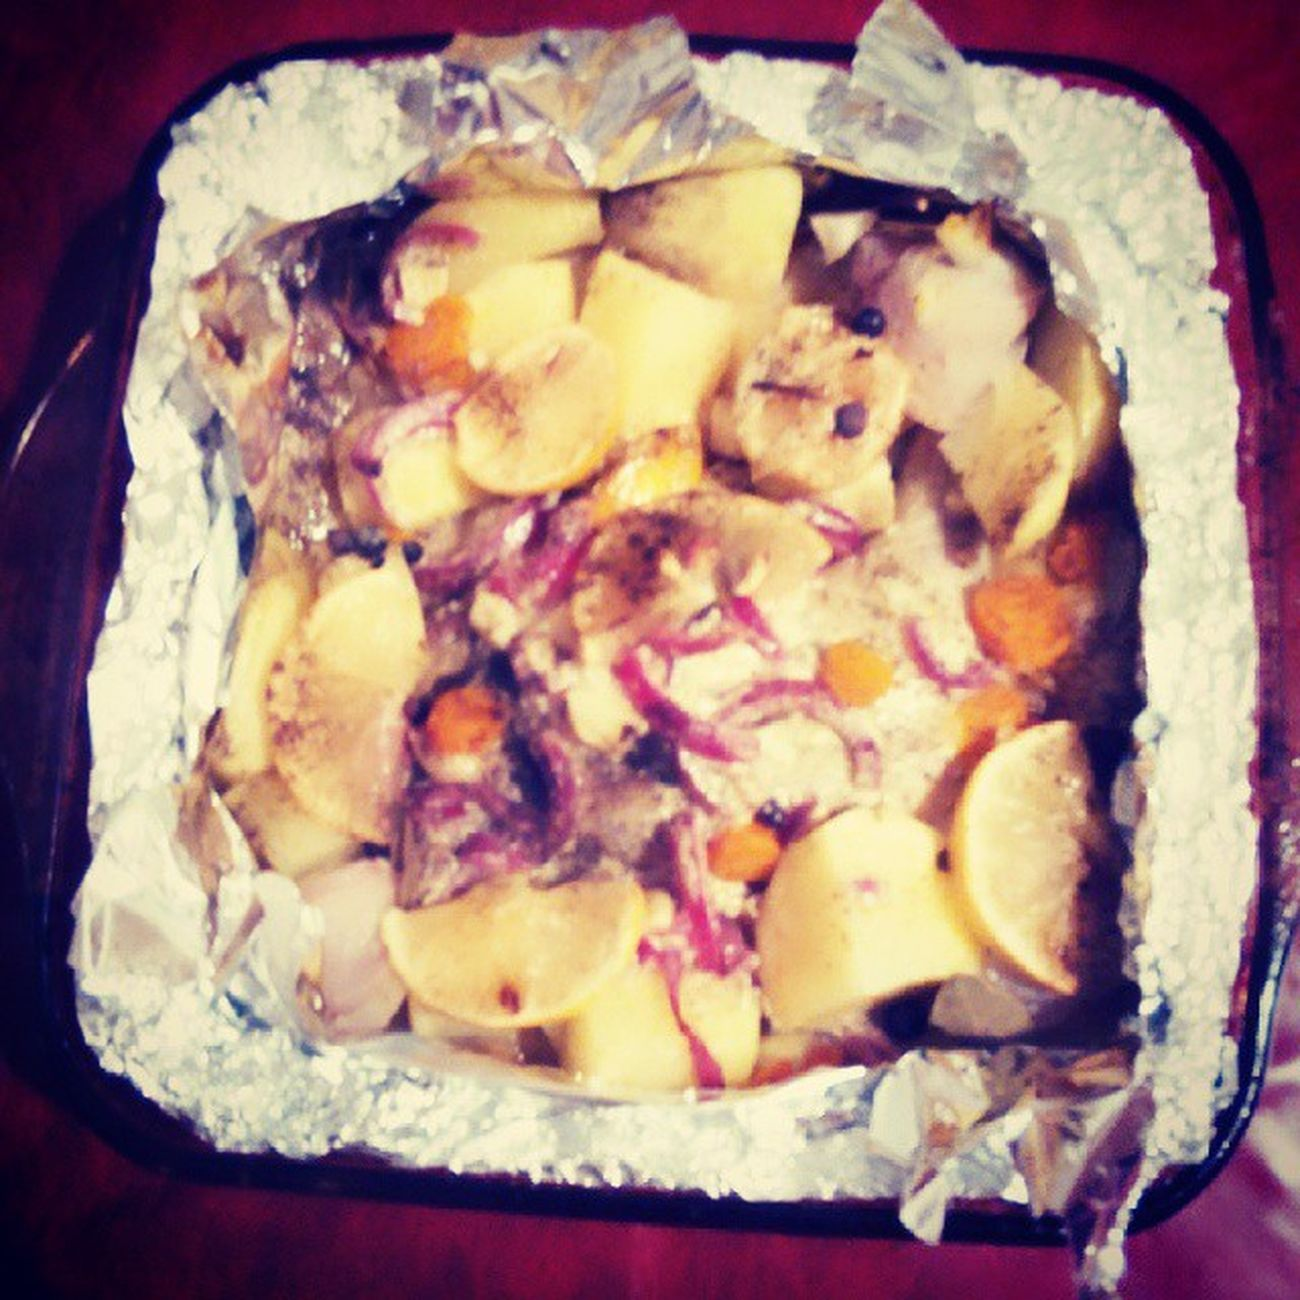 Вкусняха картофан мяско /лимончик мм ..хорошийужин